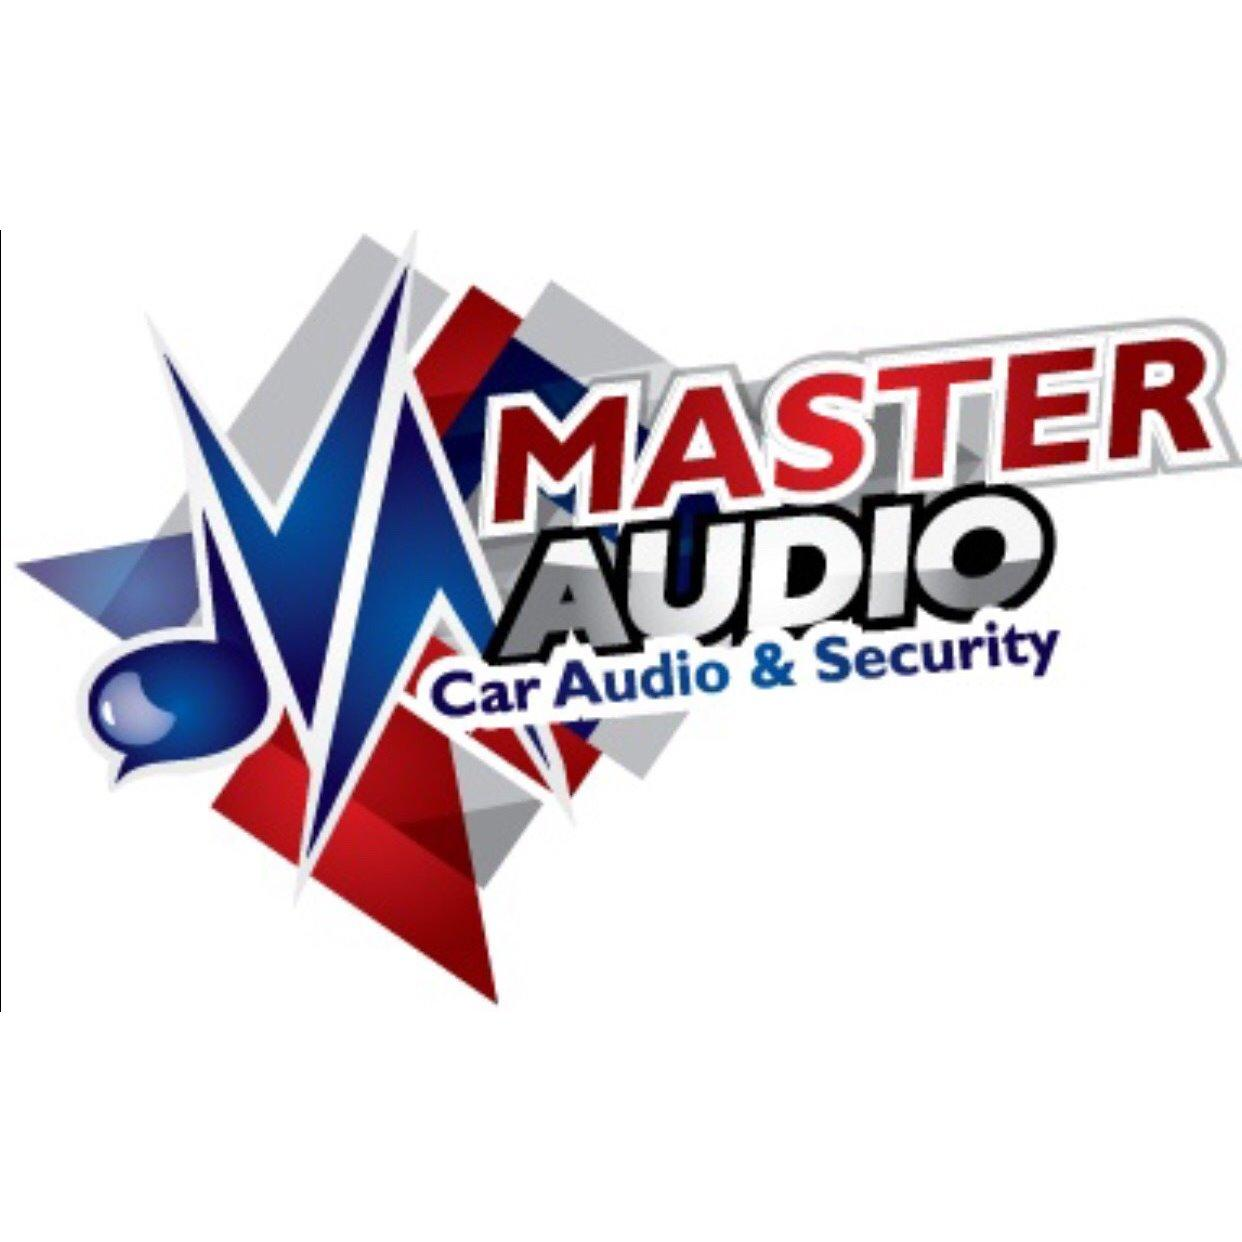 Master Audio, Car Audio and Security